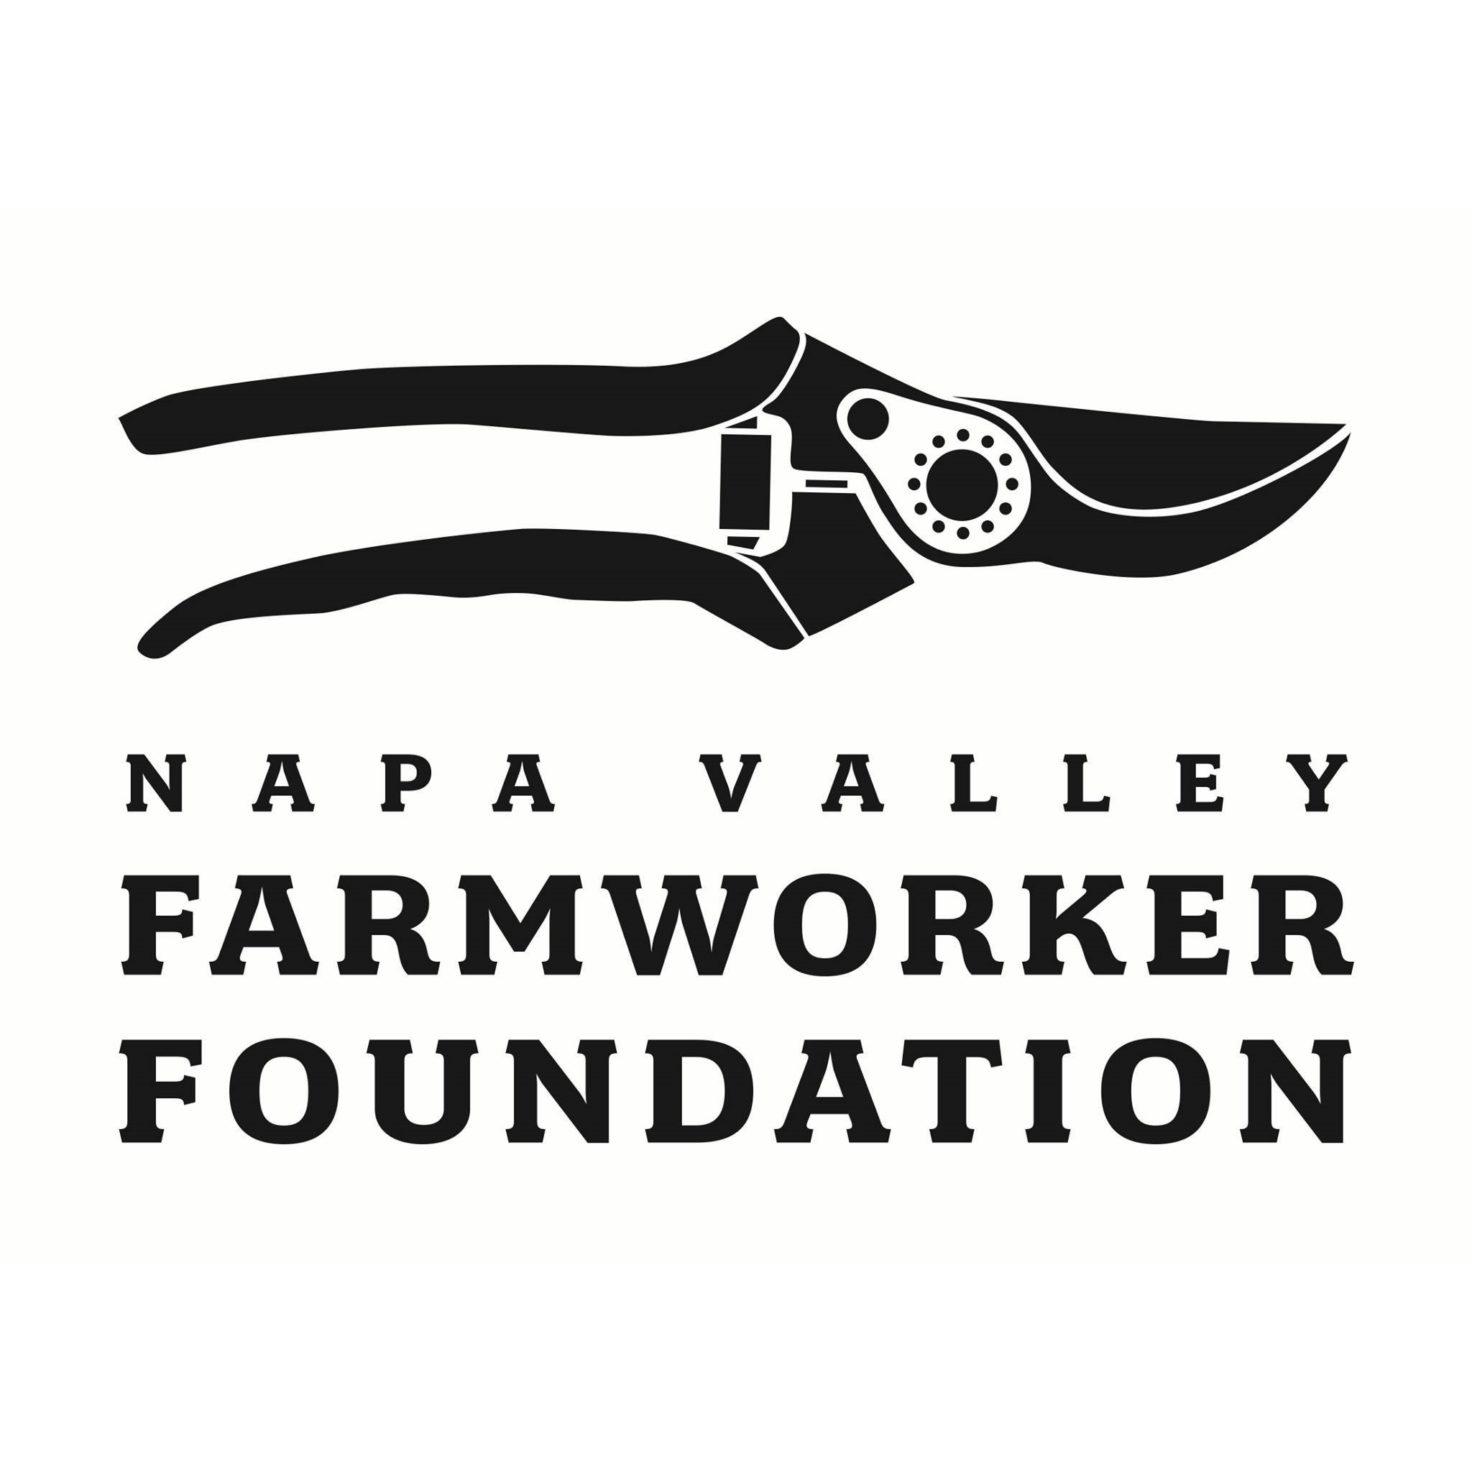 Napa Valley Farmworker Foundation